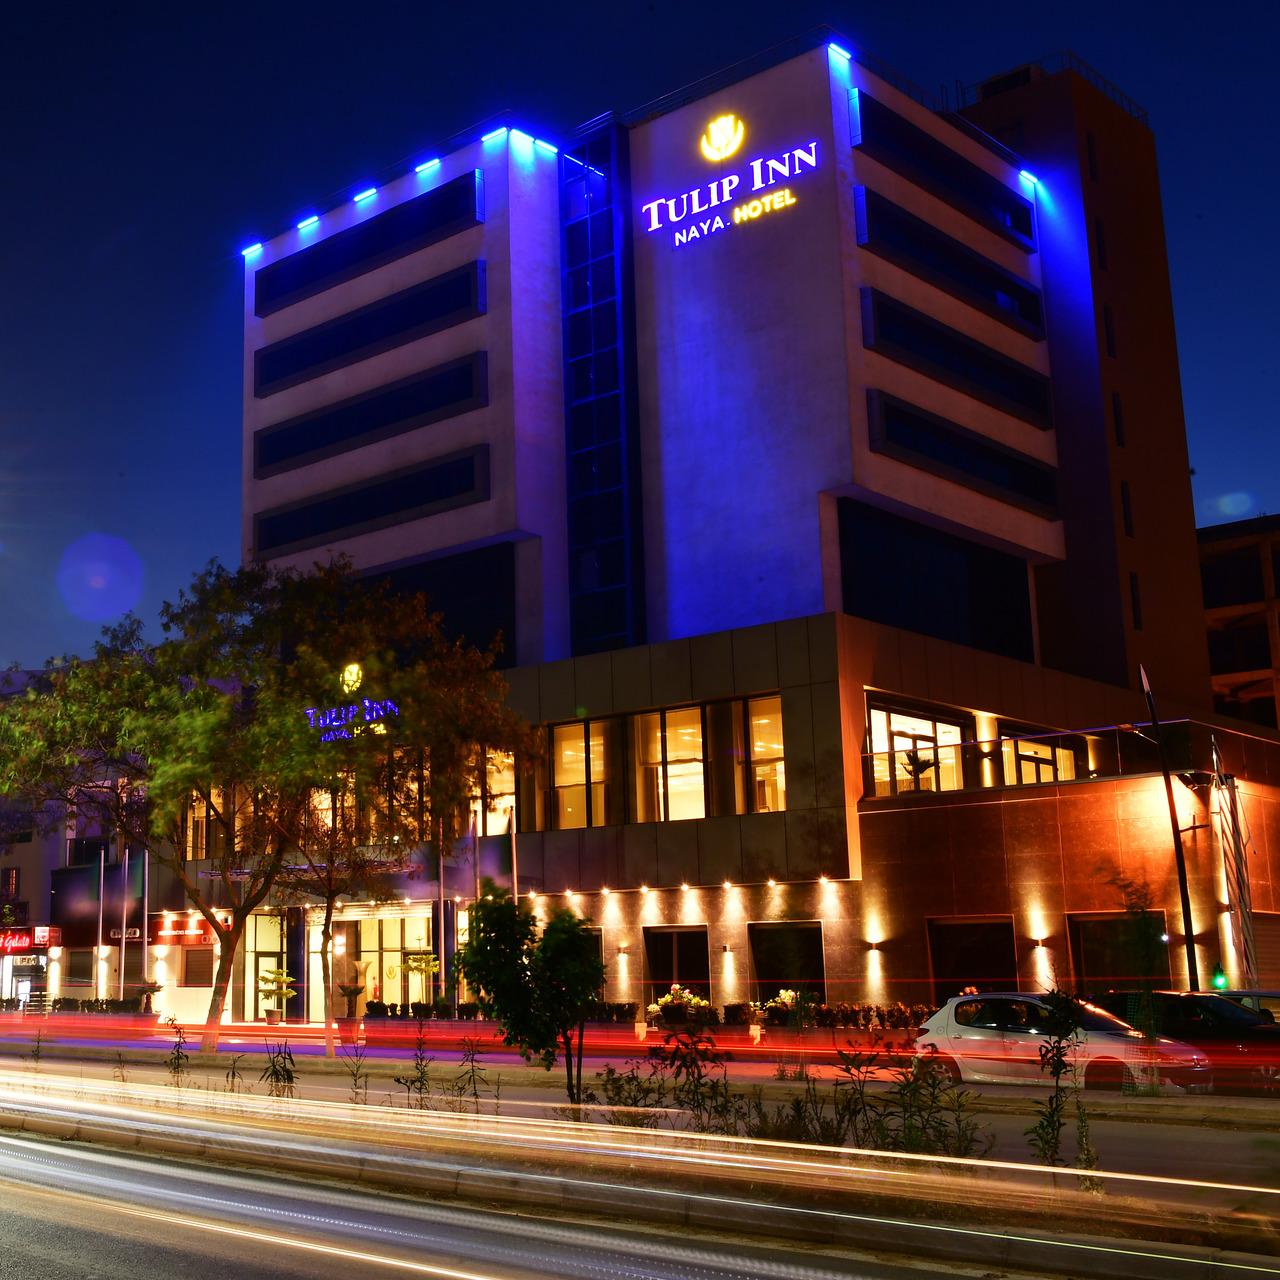 Hotel Tulip Inn Naya